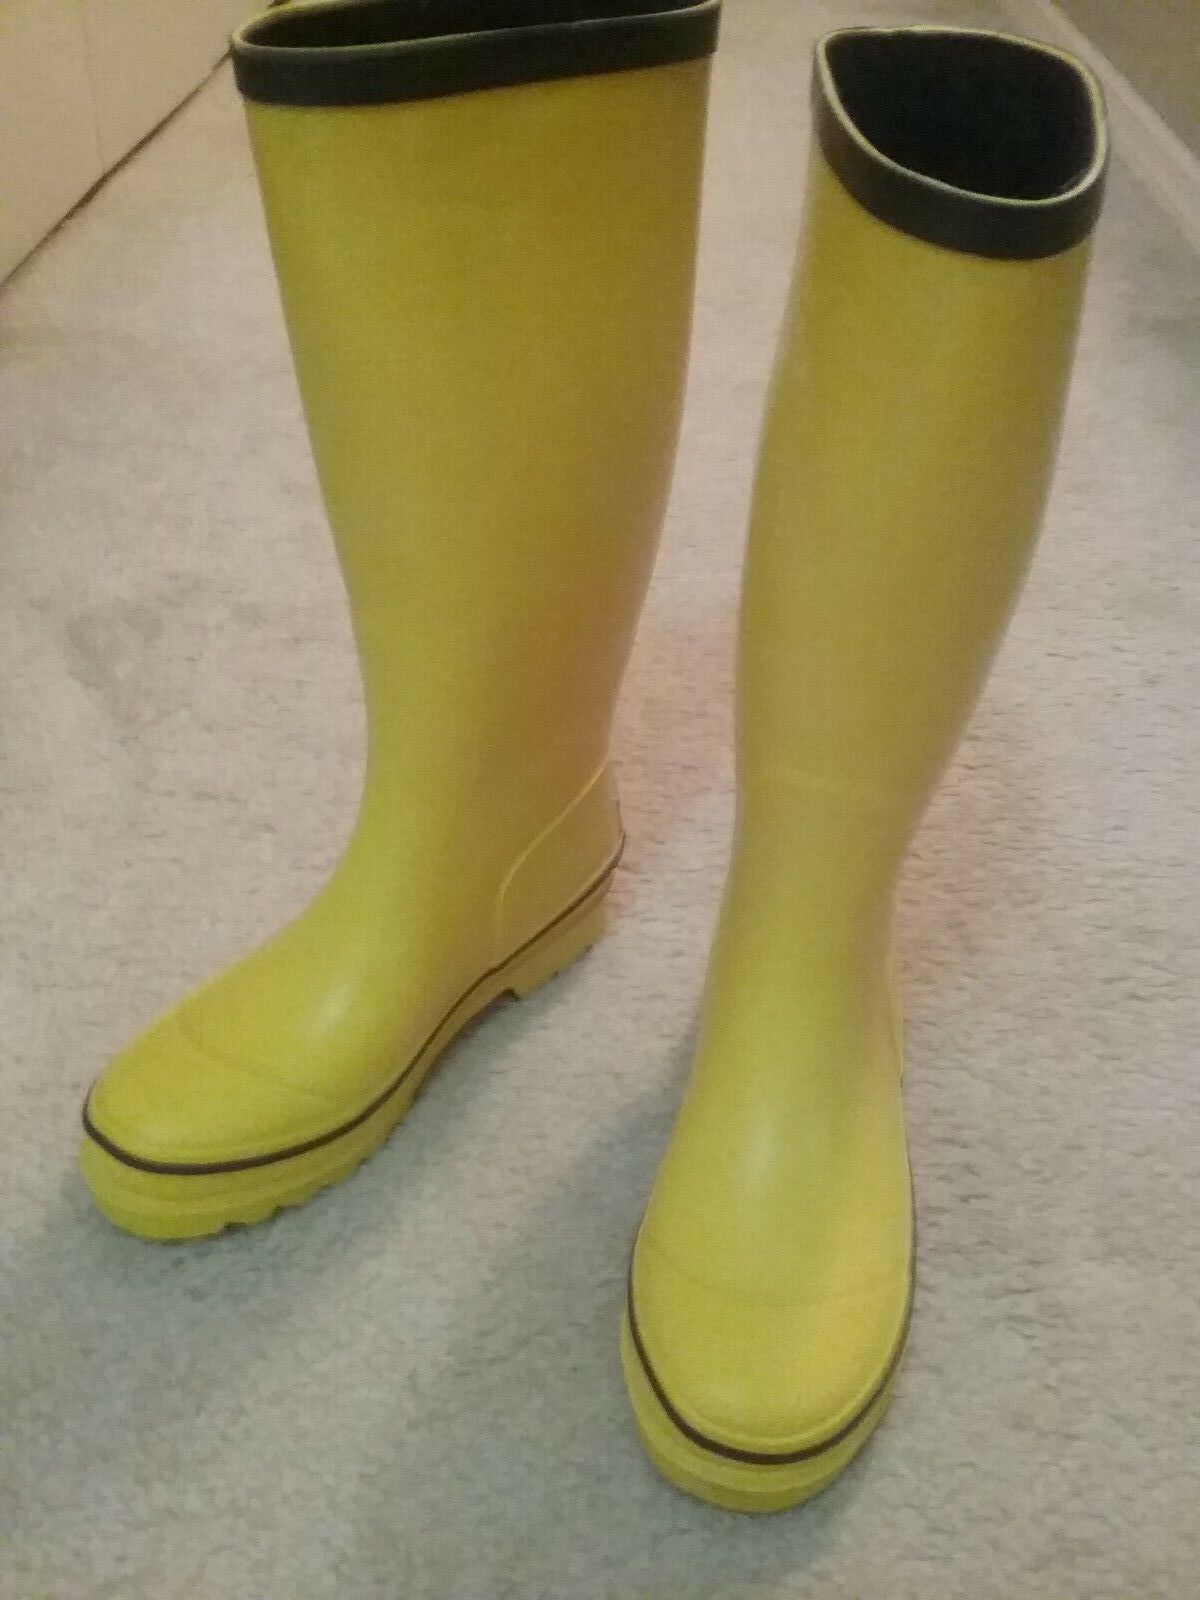 Vineyard Women new sunny yellow and navy blue rim rain boots size 6